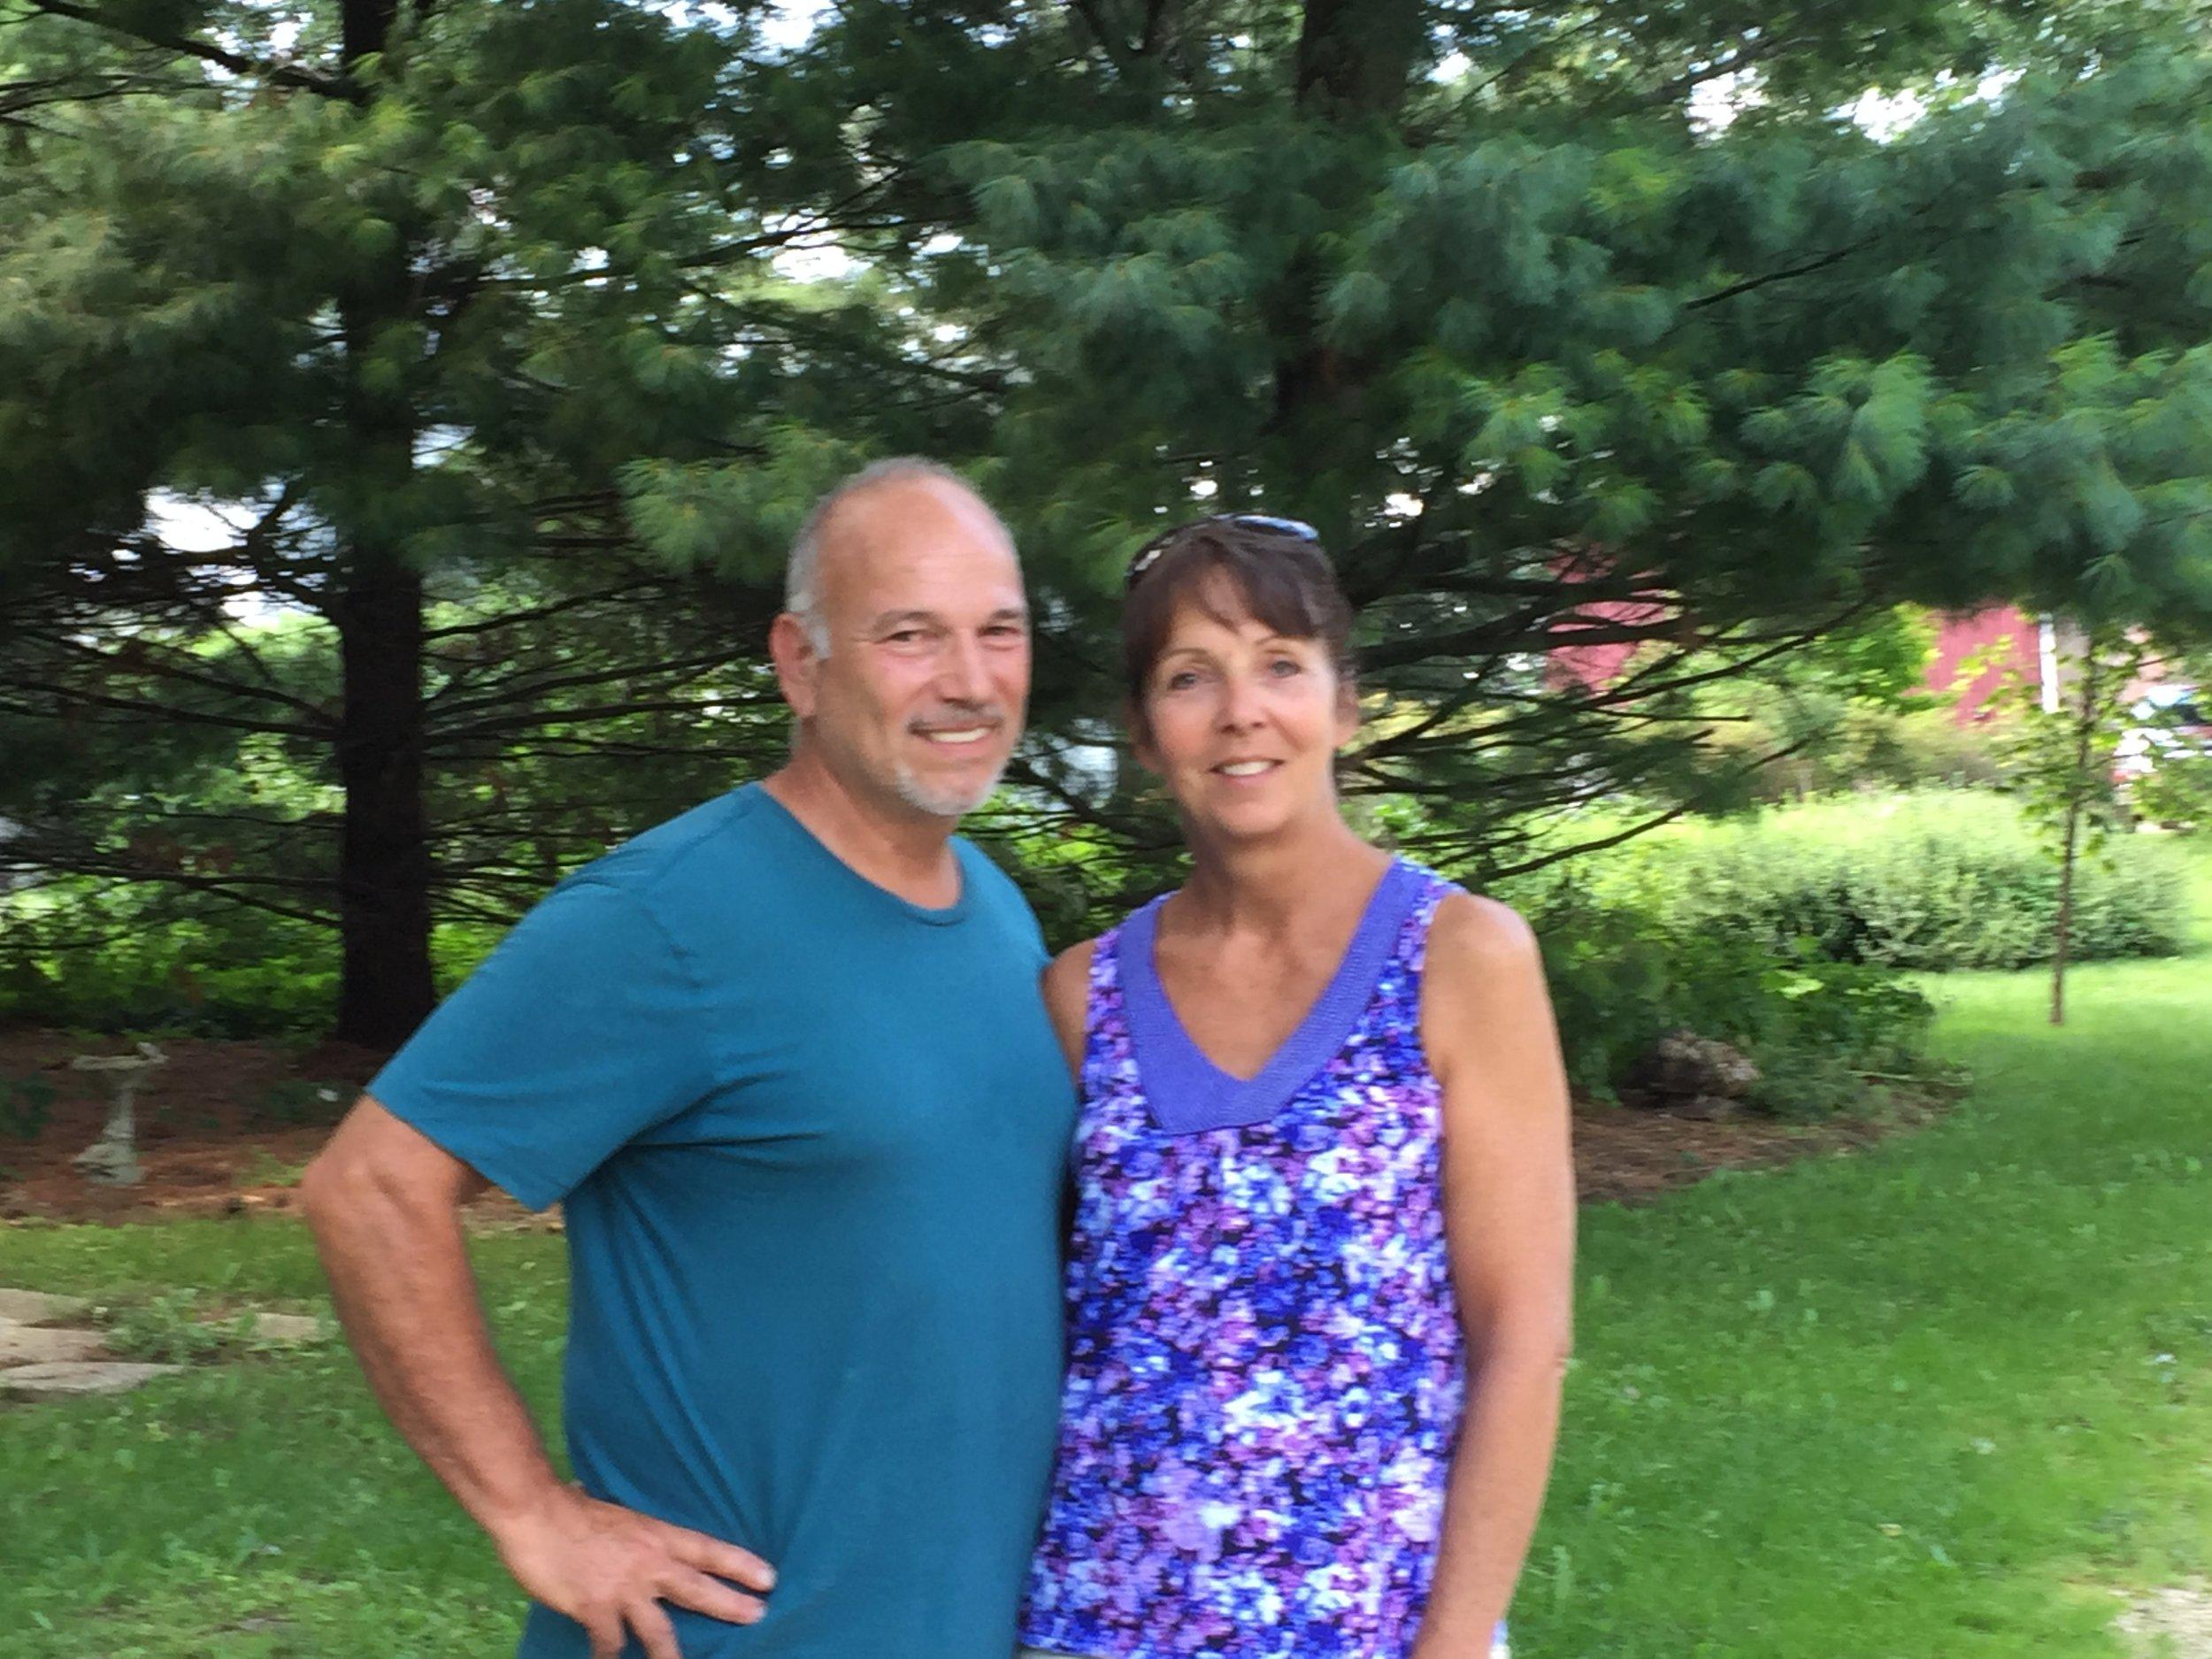 Liz and Tony Fiorenza, Wind Ridge Herb Farm